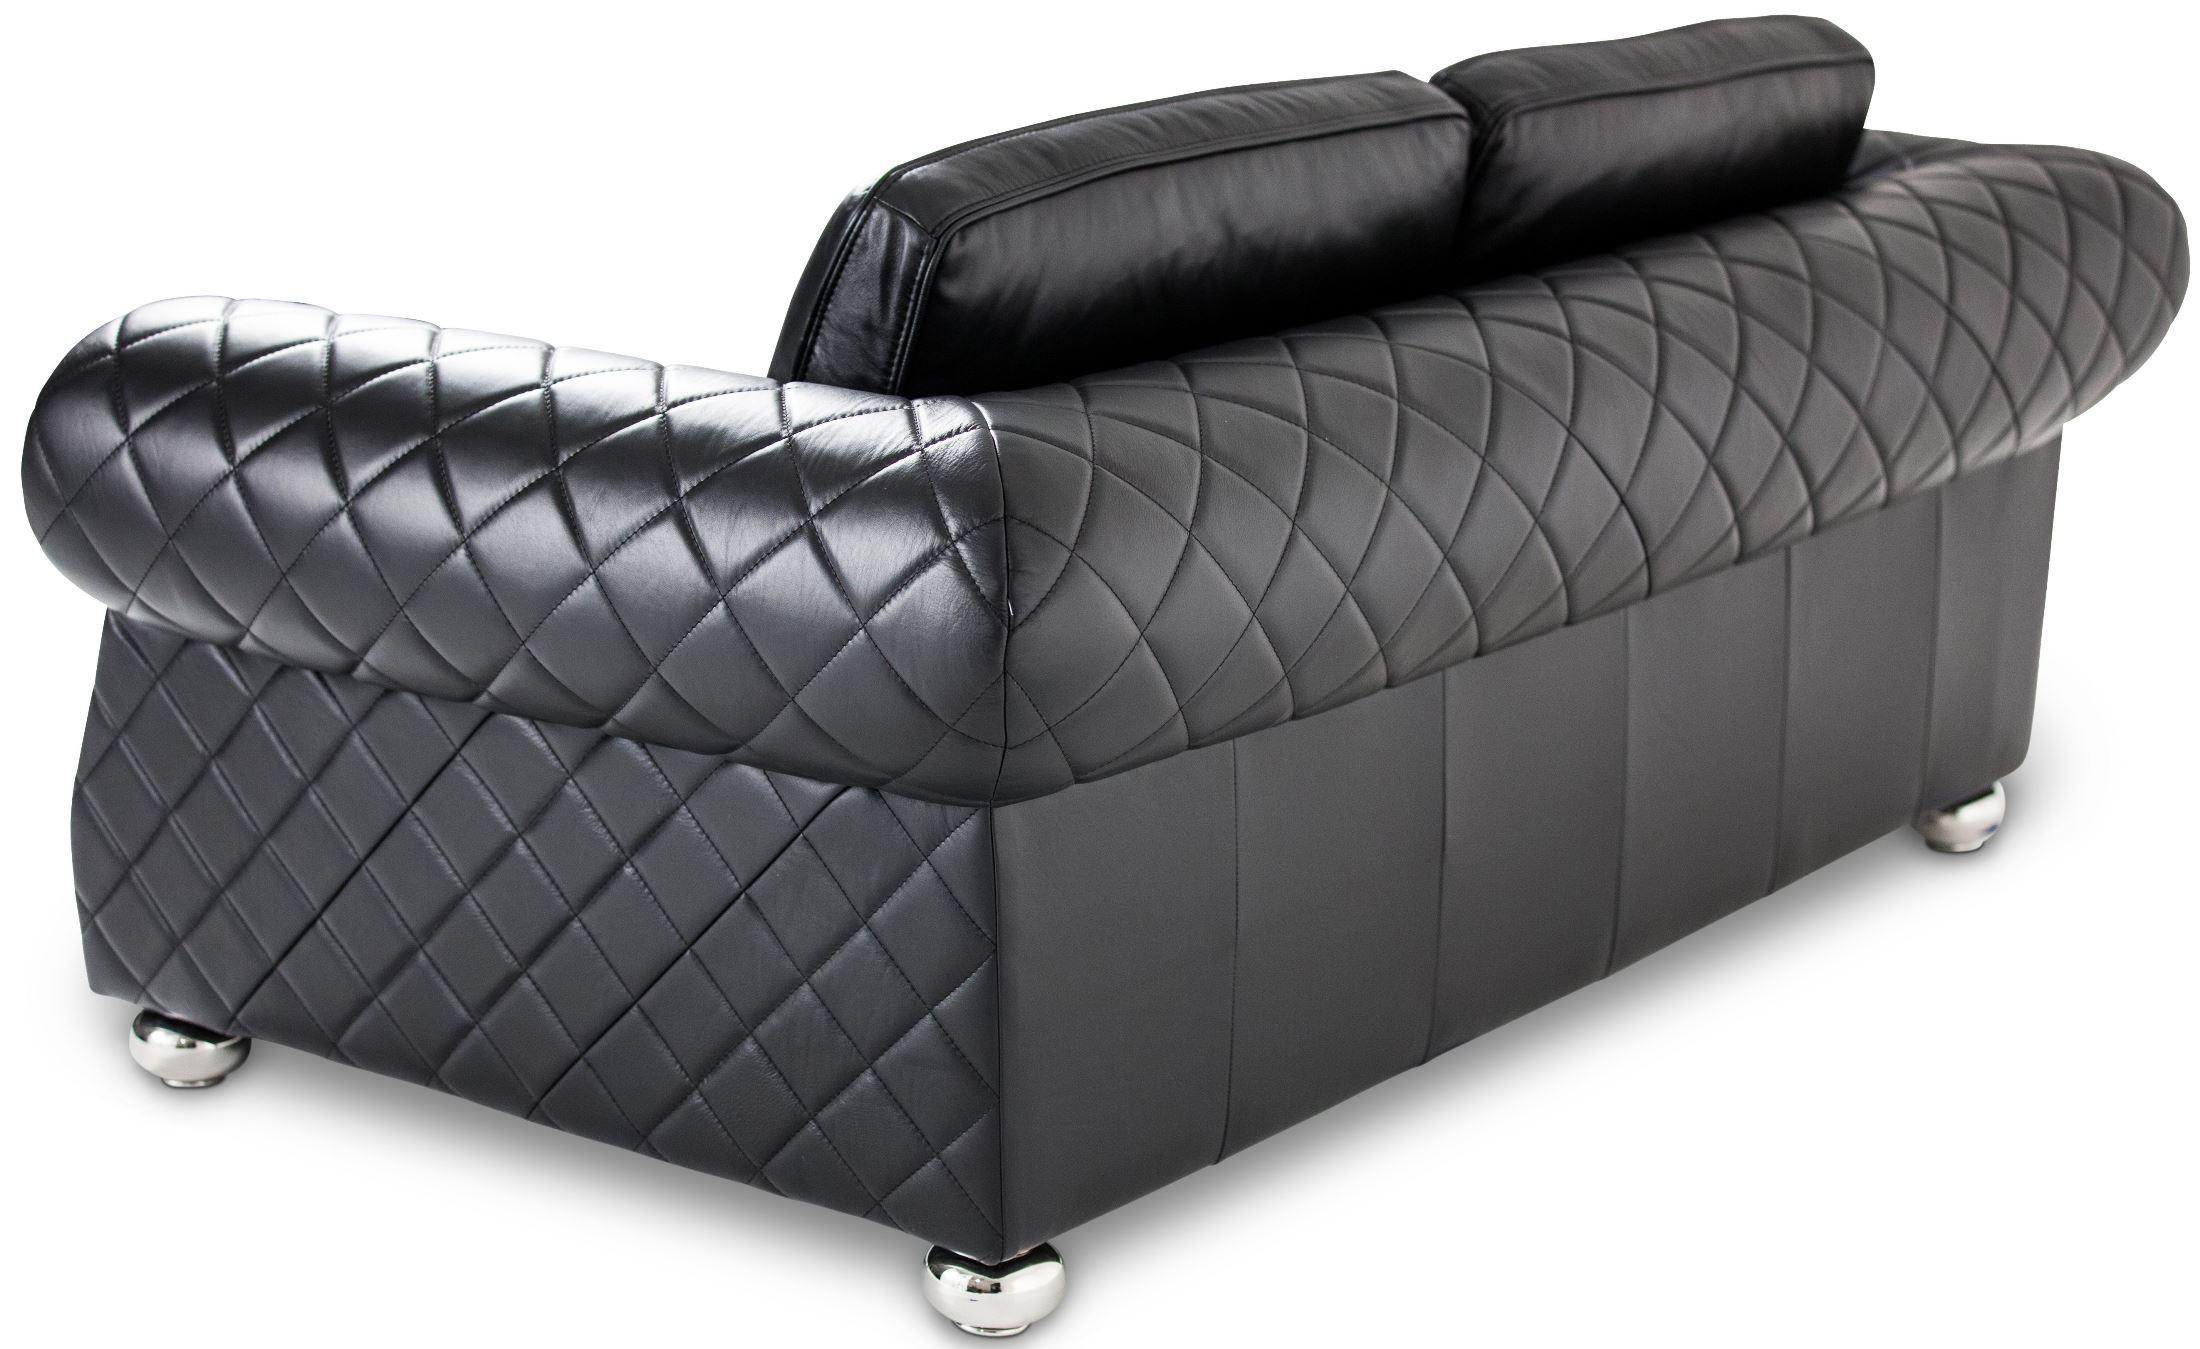 Mia Bella Black Leather Living Room Set Mb Lugan15 Sbl 13